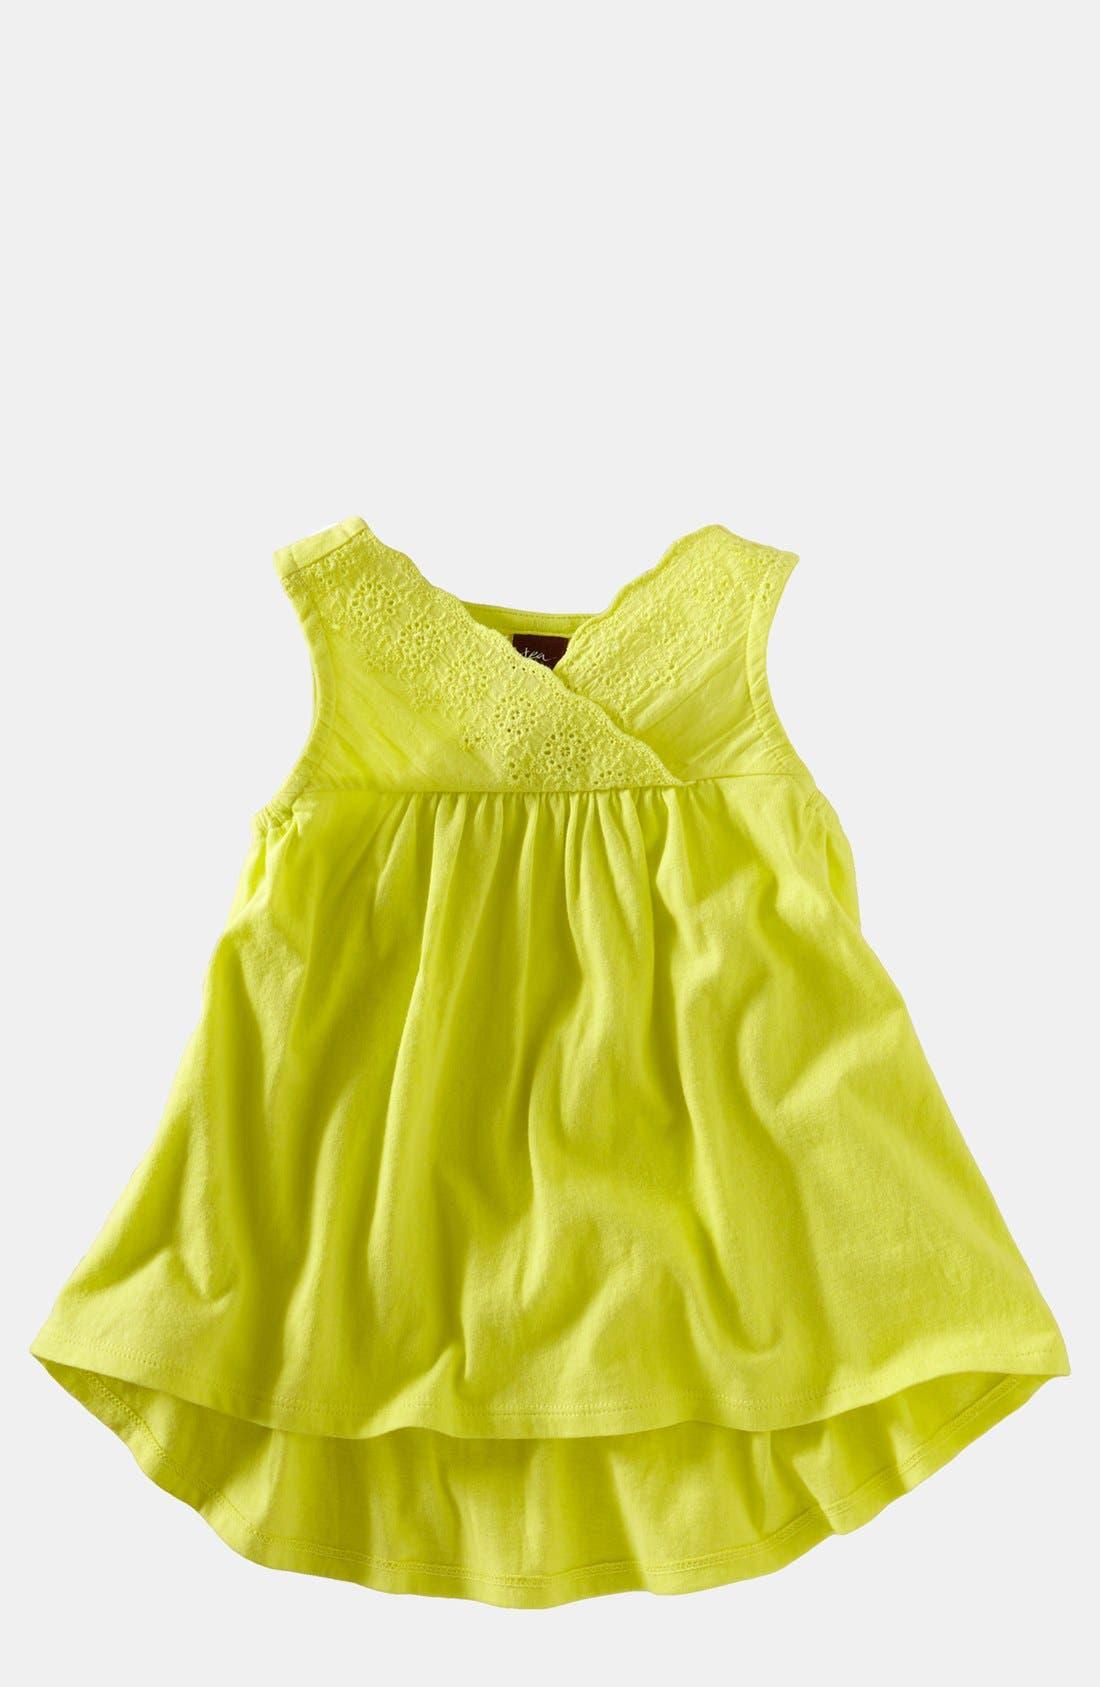 Alternate Image 1 Selected - Tea Collection Sleeveless Top (Little Girls & Big Girls)